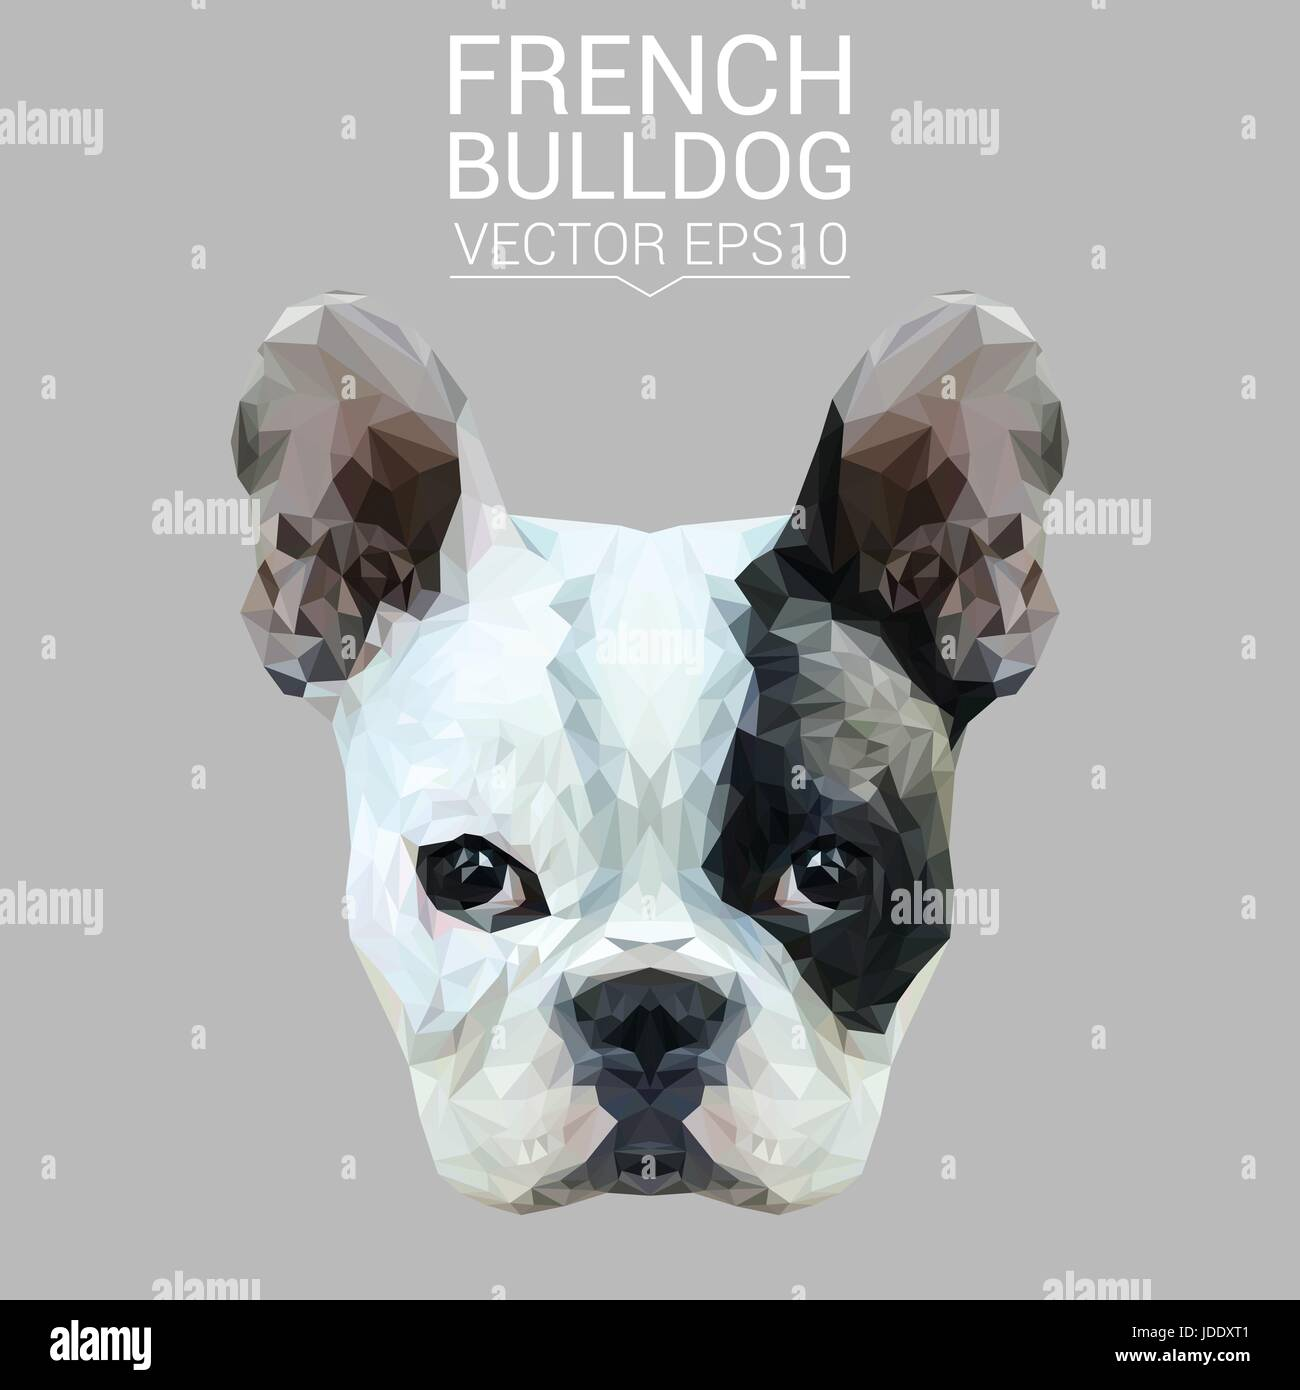 Französische Bulldogge Tier low-Poly-Design. Dreieck-Vektor-Illustration. Stockbild